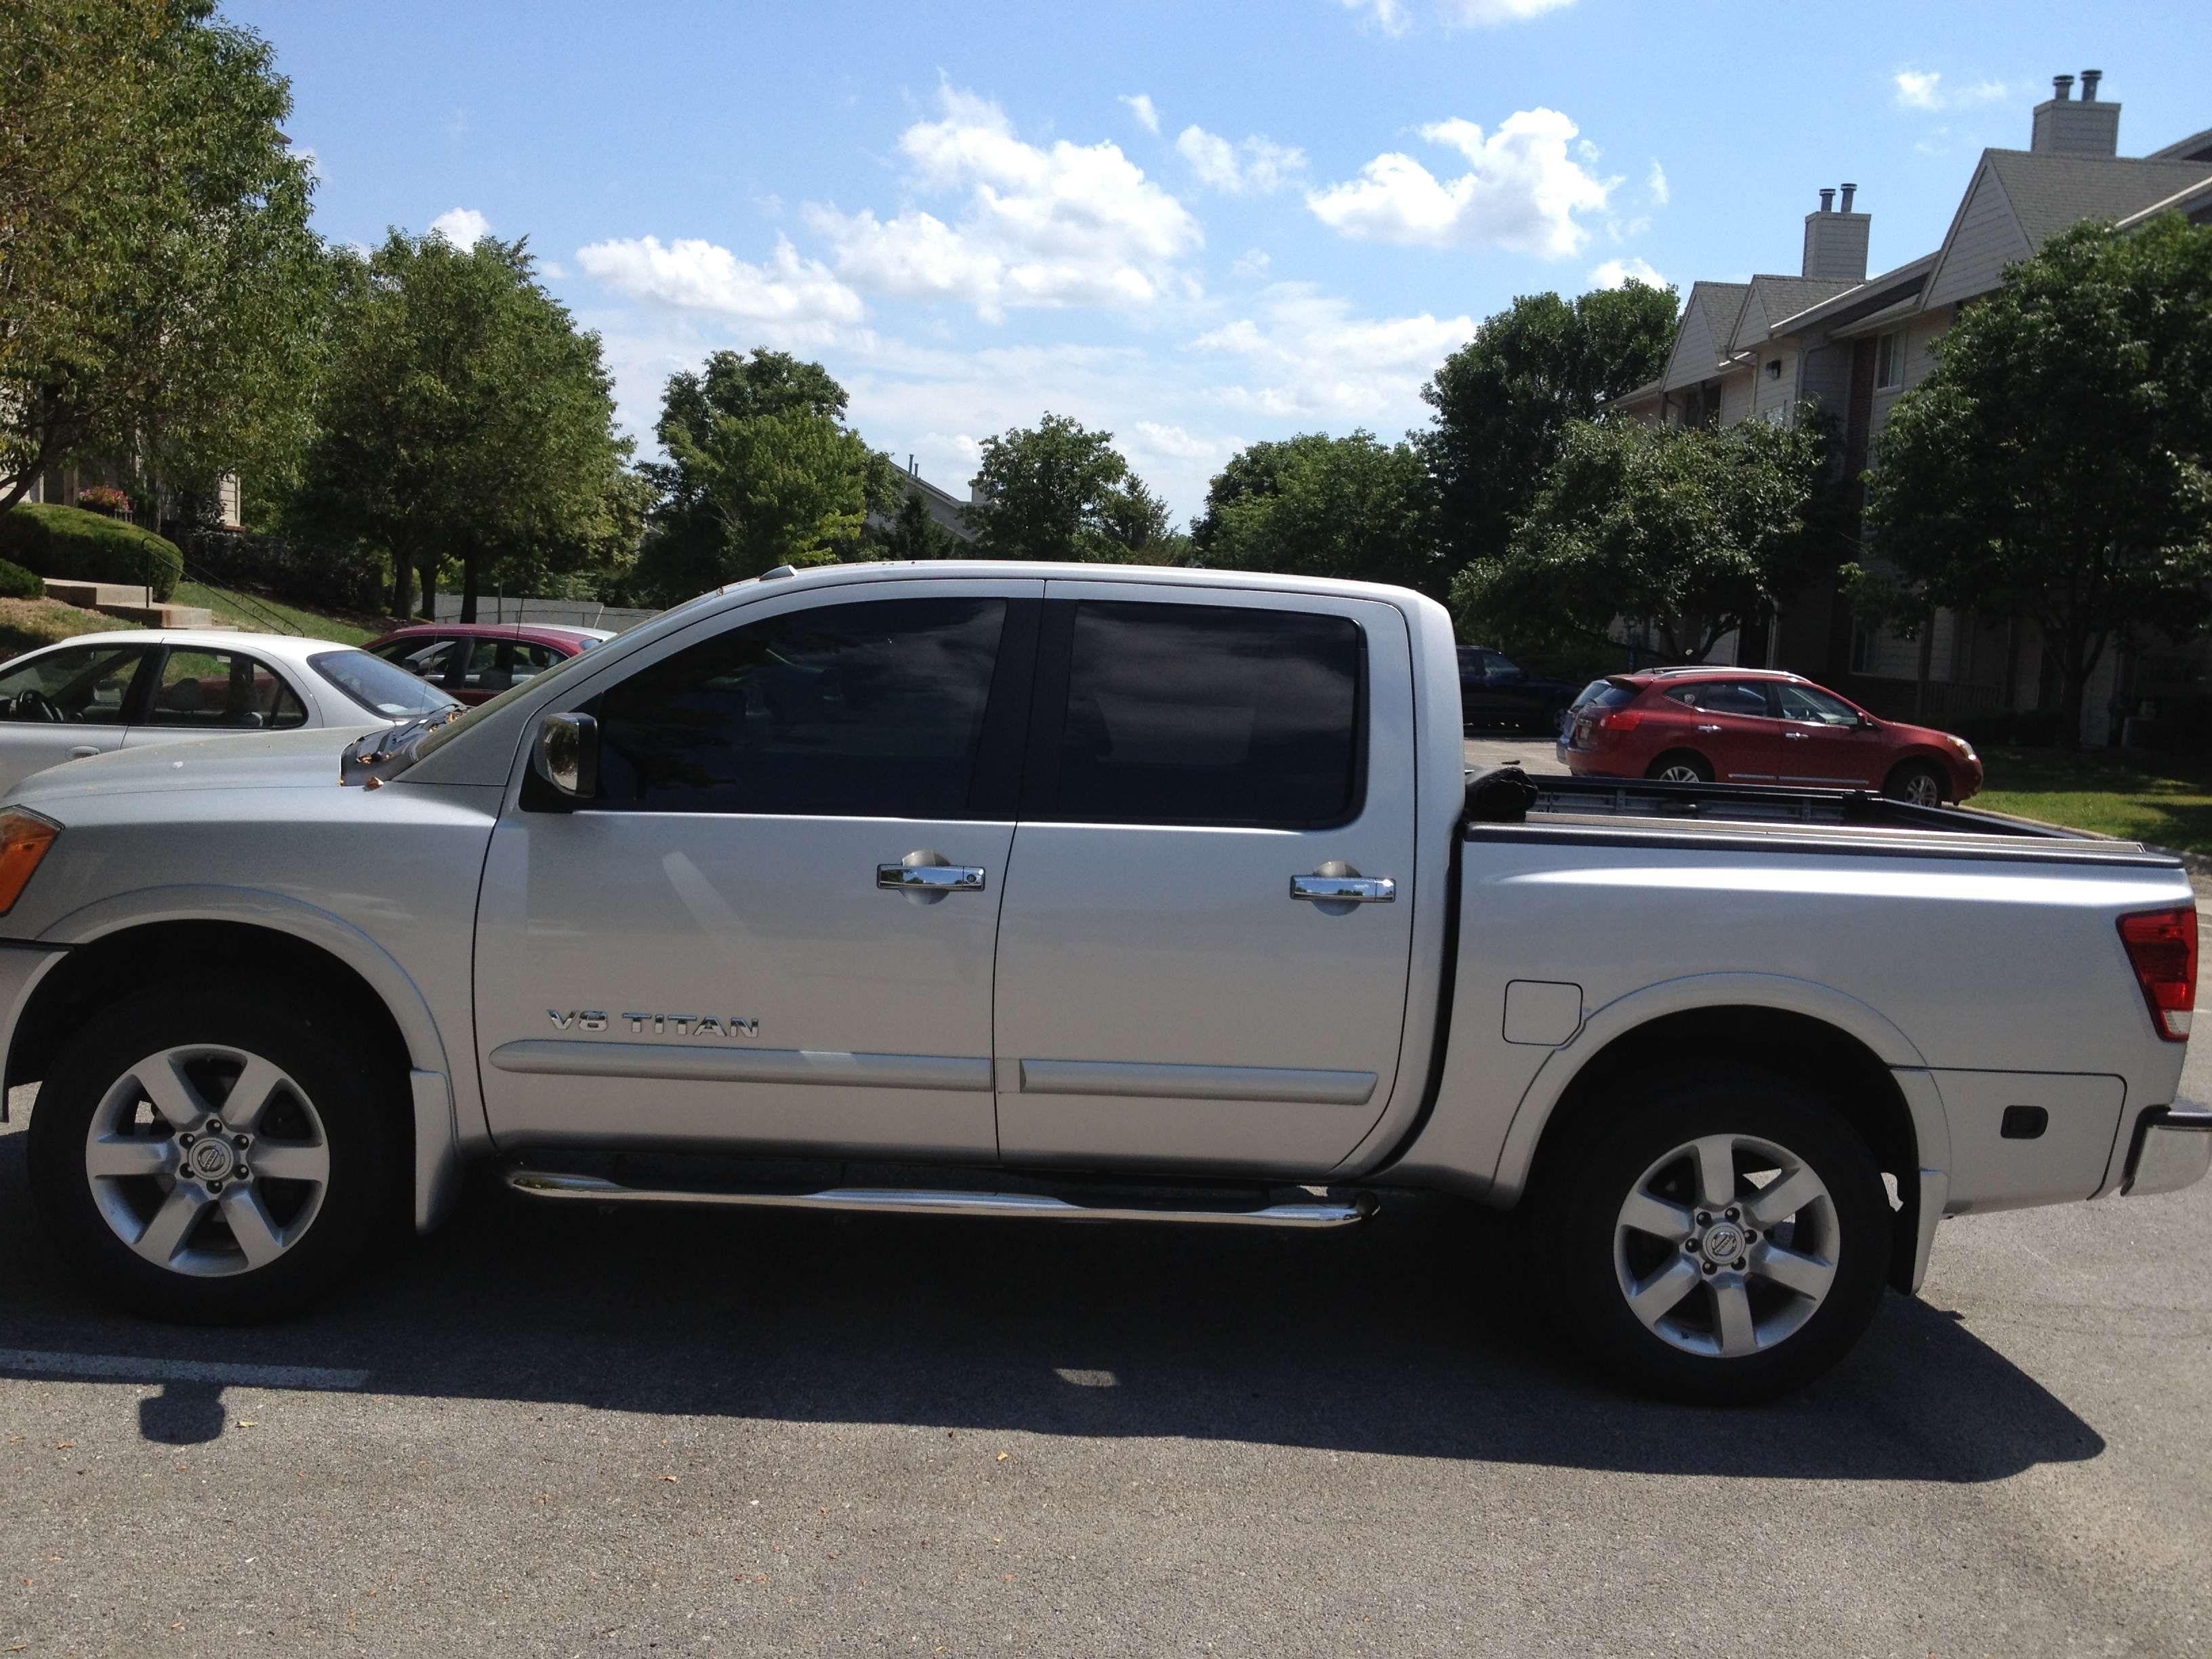 Make Nissan Model Titan Year 2010 Body Style Ute Pick Up